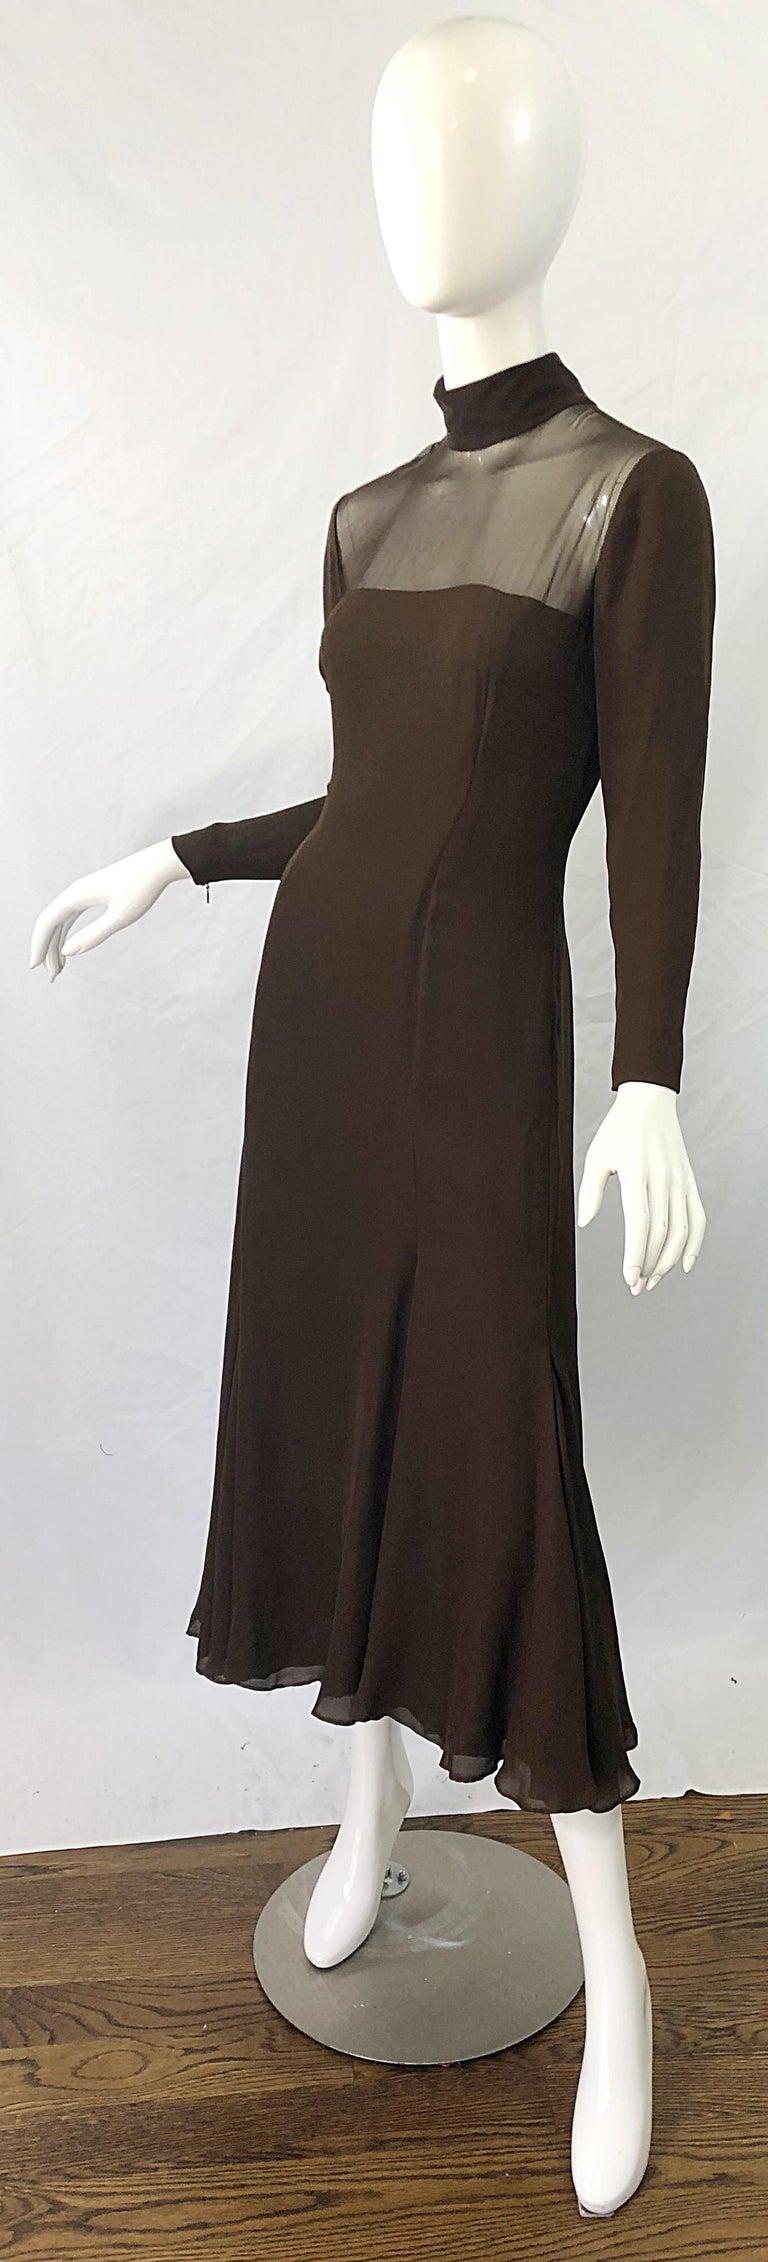 1970s Nolan Miller Couture Chocolate Brown Silk Chiffon Vintage 70s Midi Dress For Sale 1